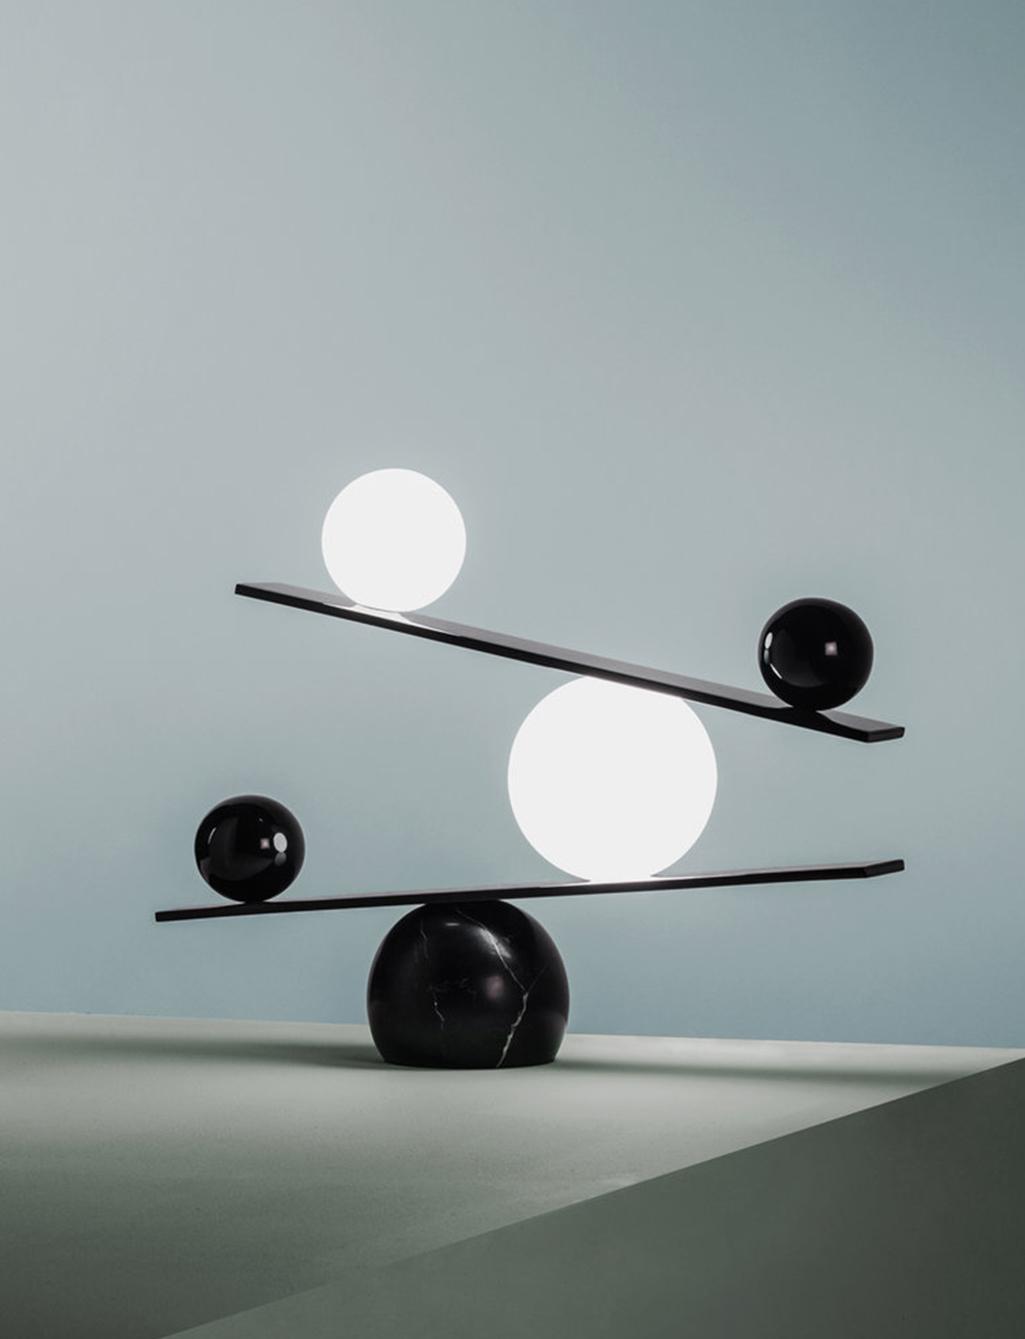 New Brand Launch: Swedish Lighting Maker Oblure